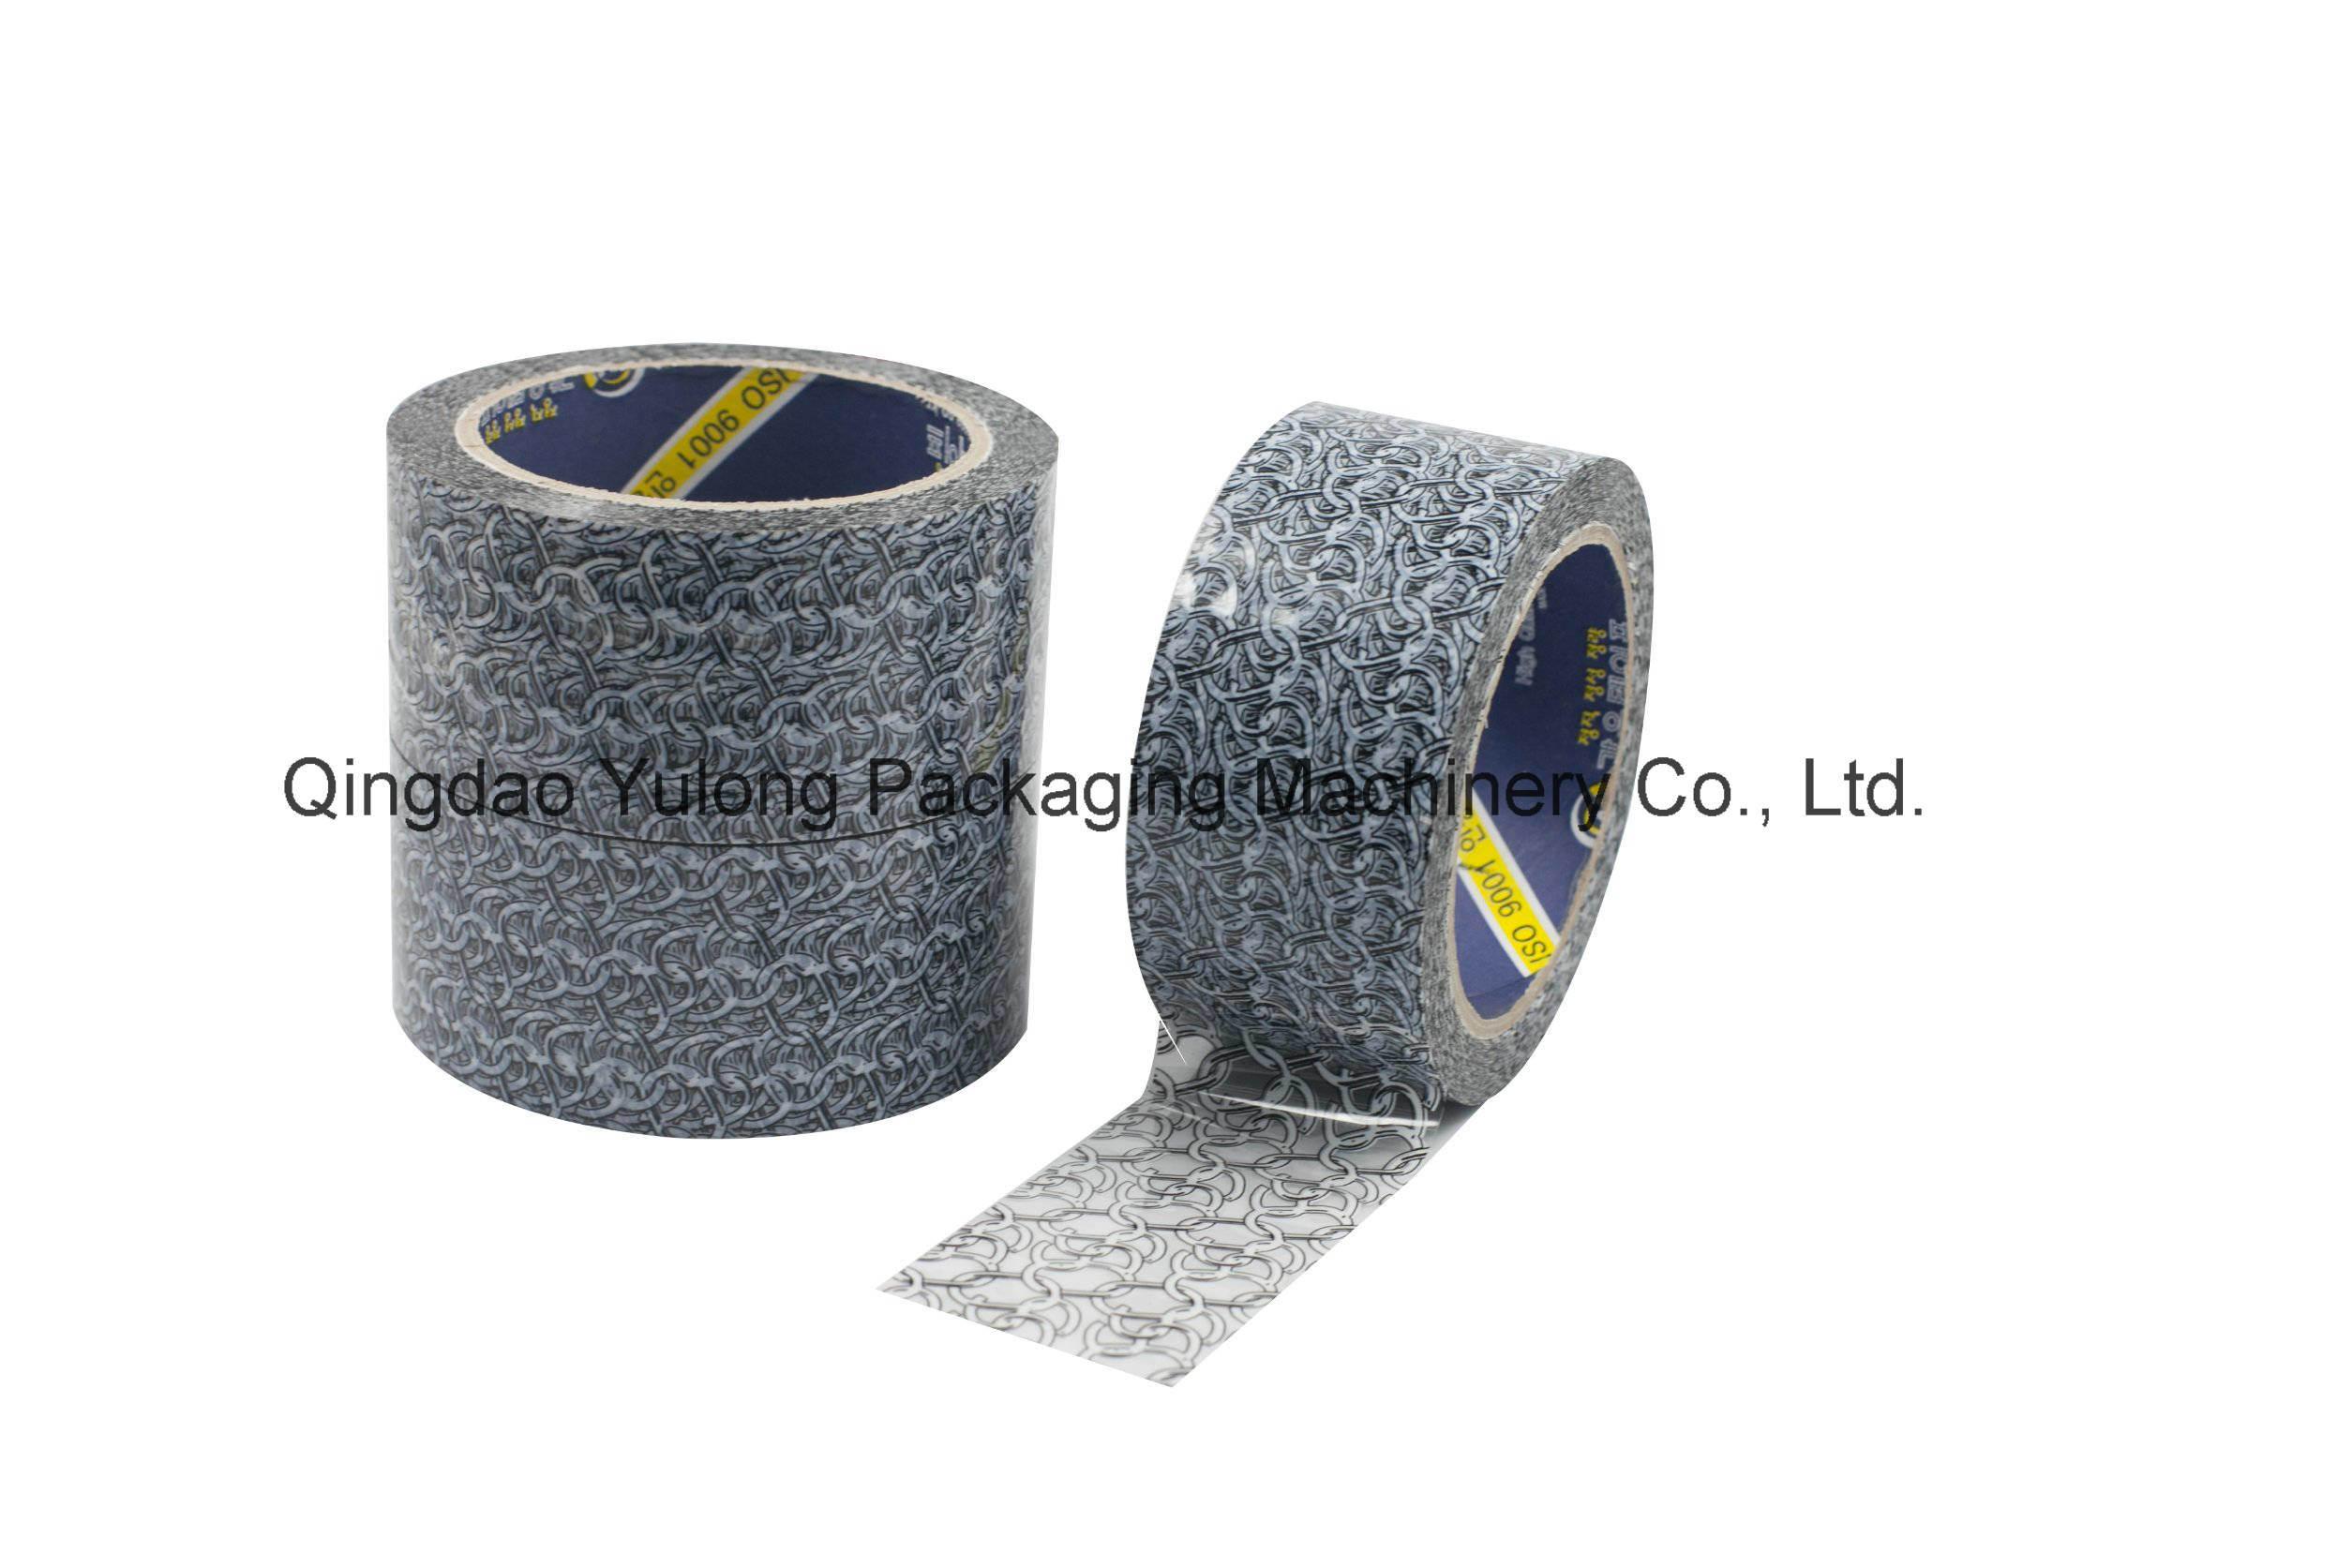 BOPP Printed Adhesive Packing Tape